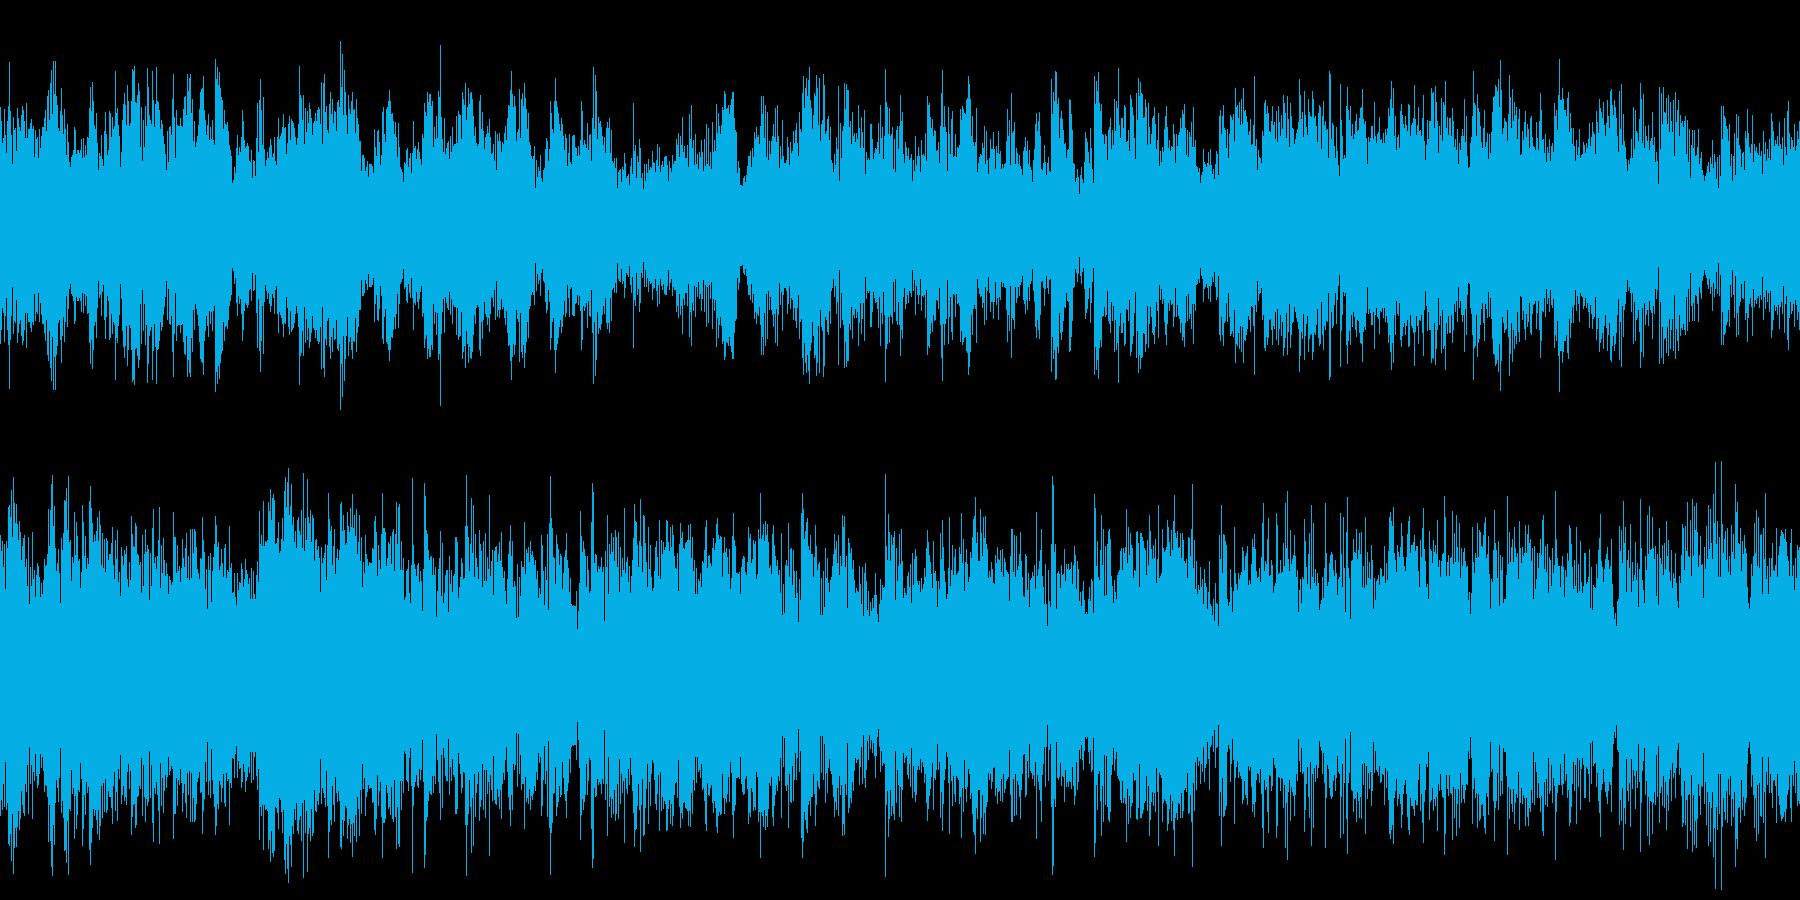 UFOキャッチャー背景音【ループ】の再生済みの波形